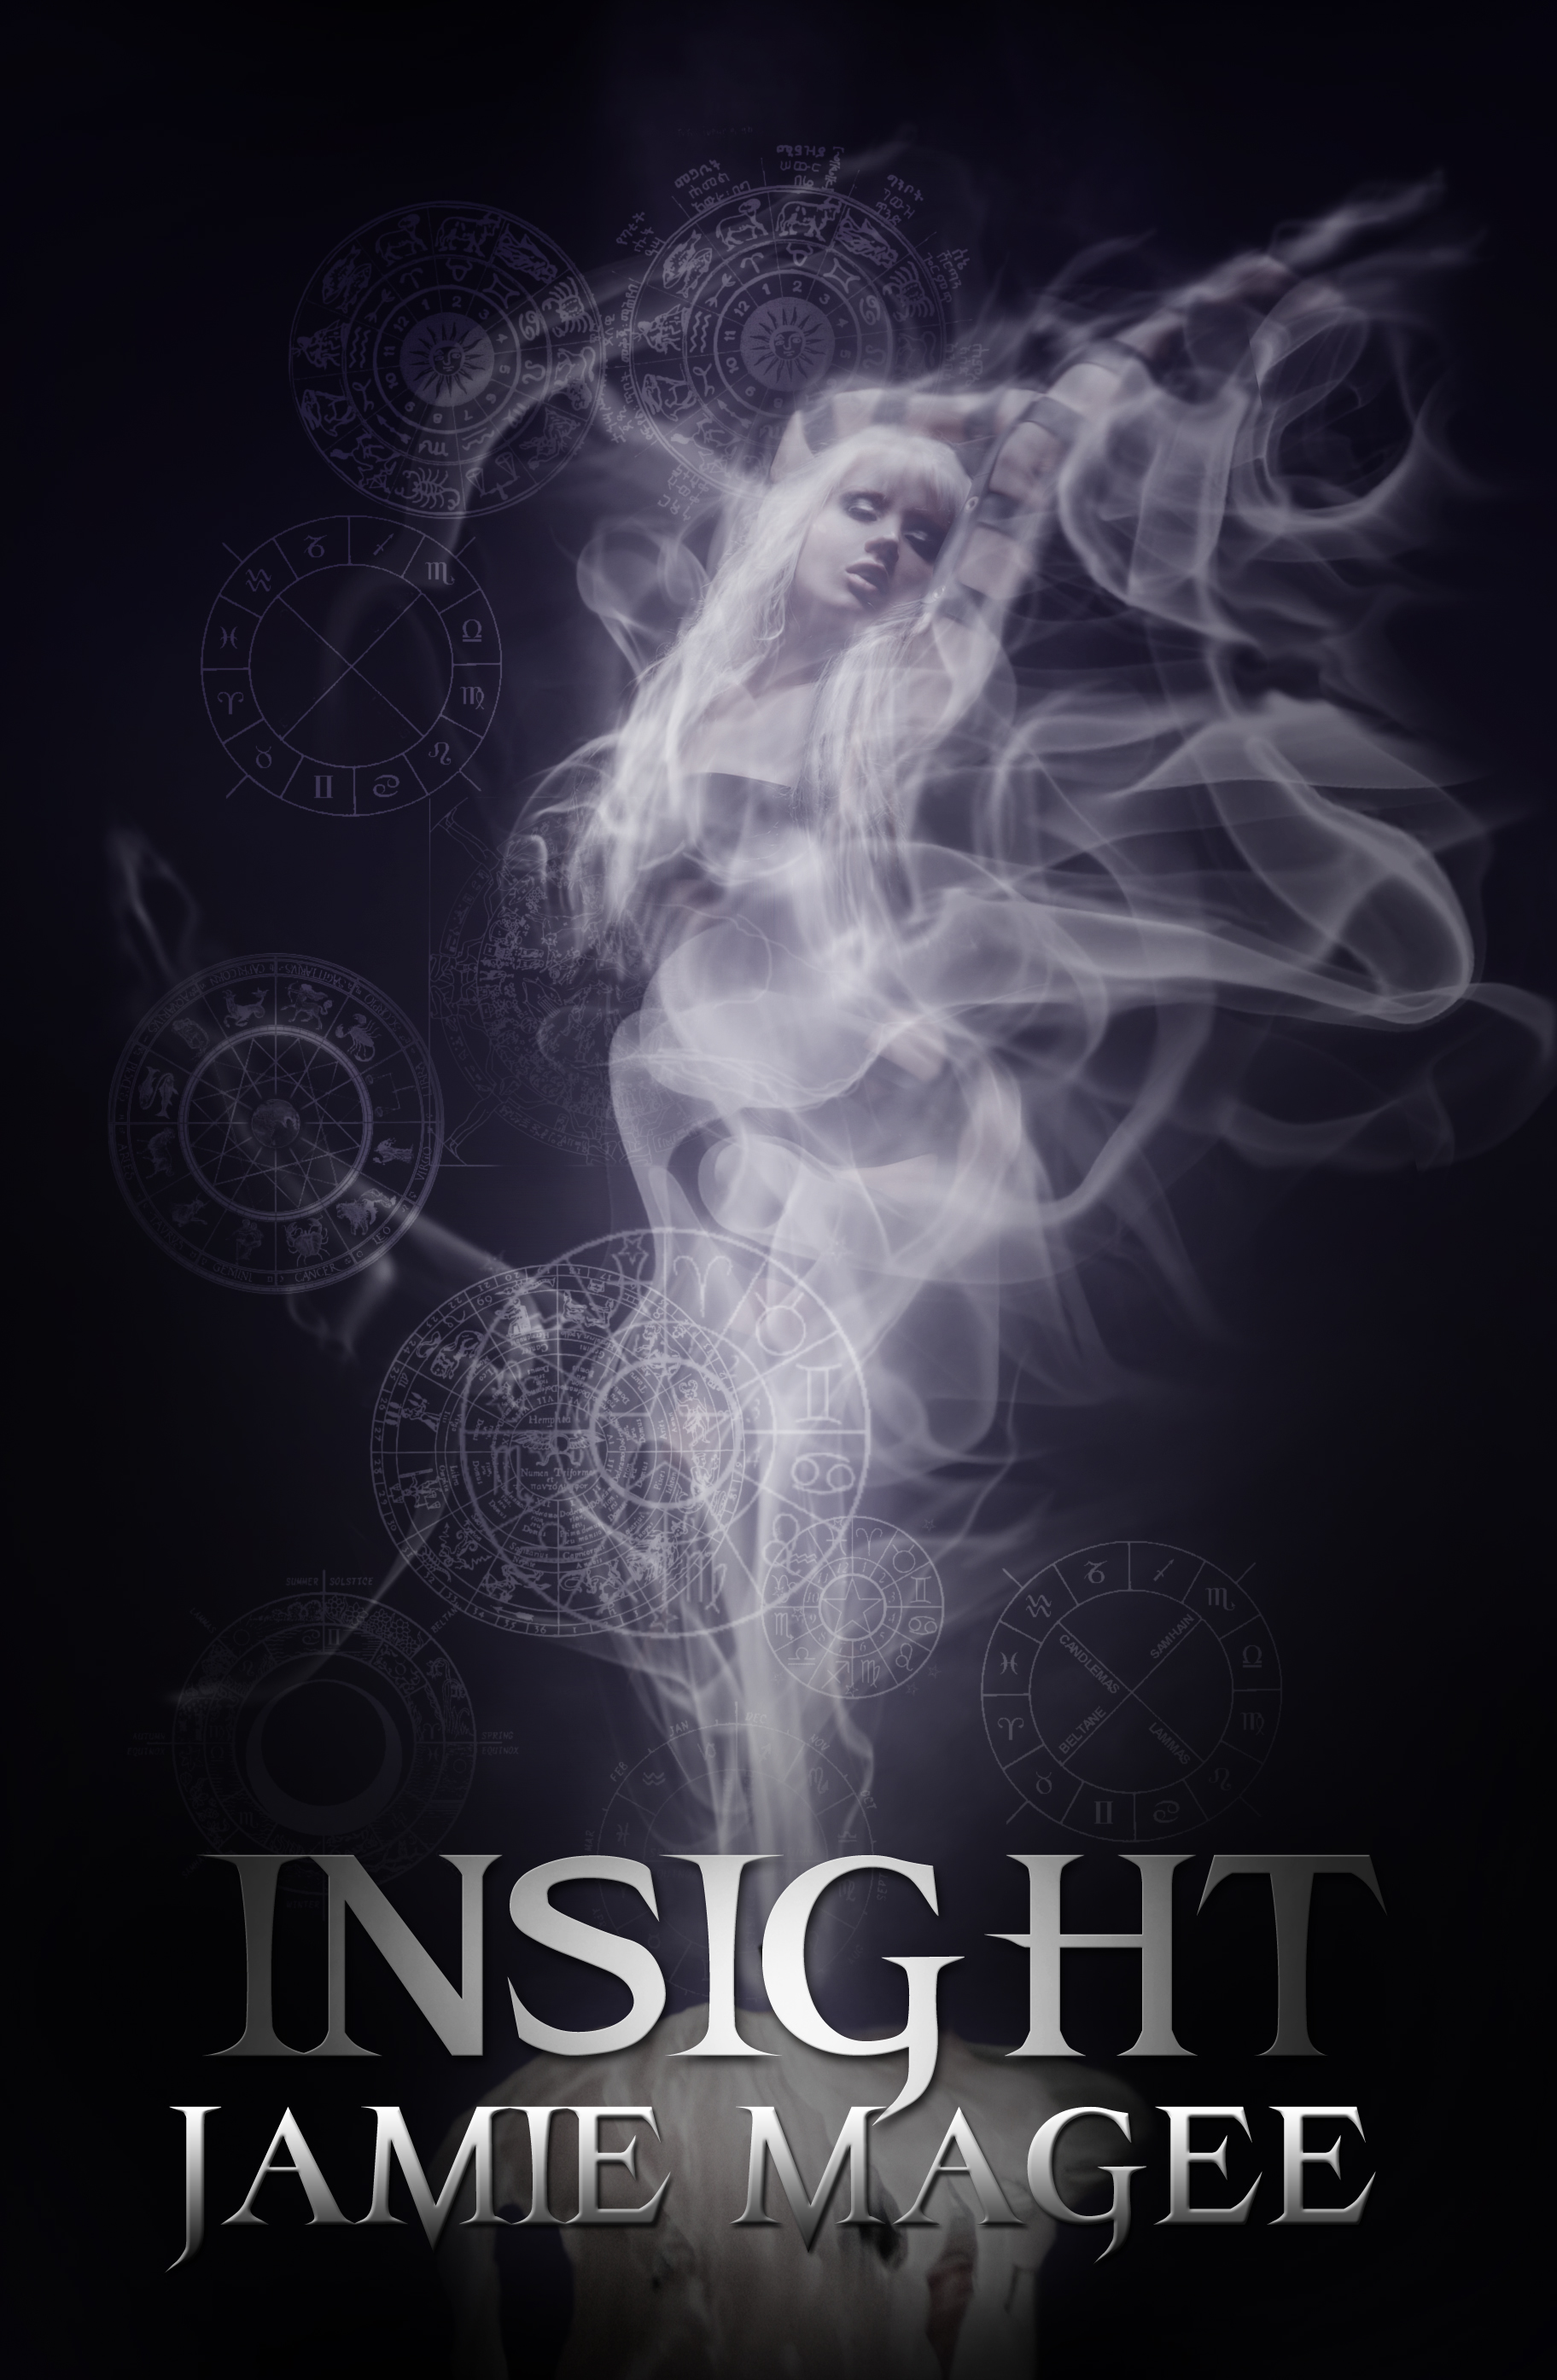 Jamie Magee - Insight